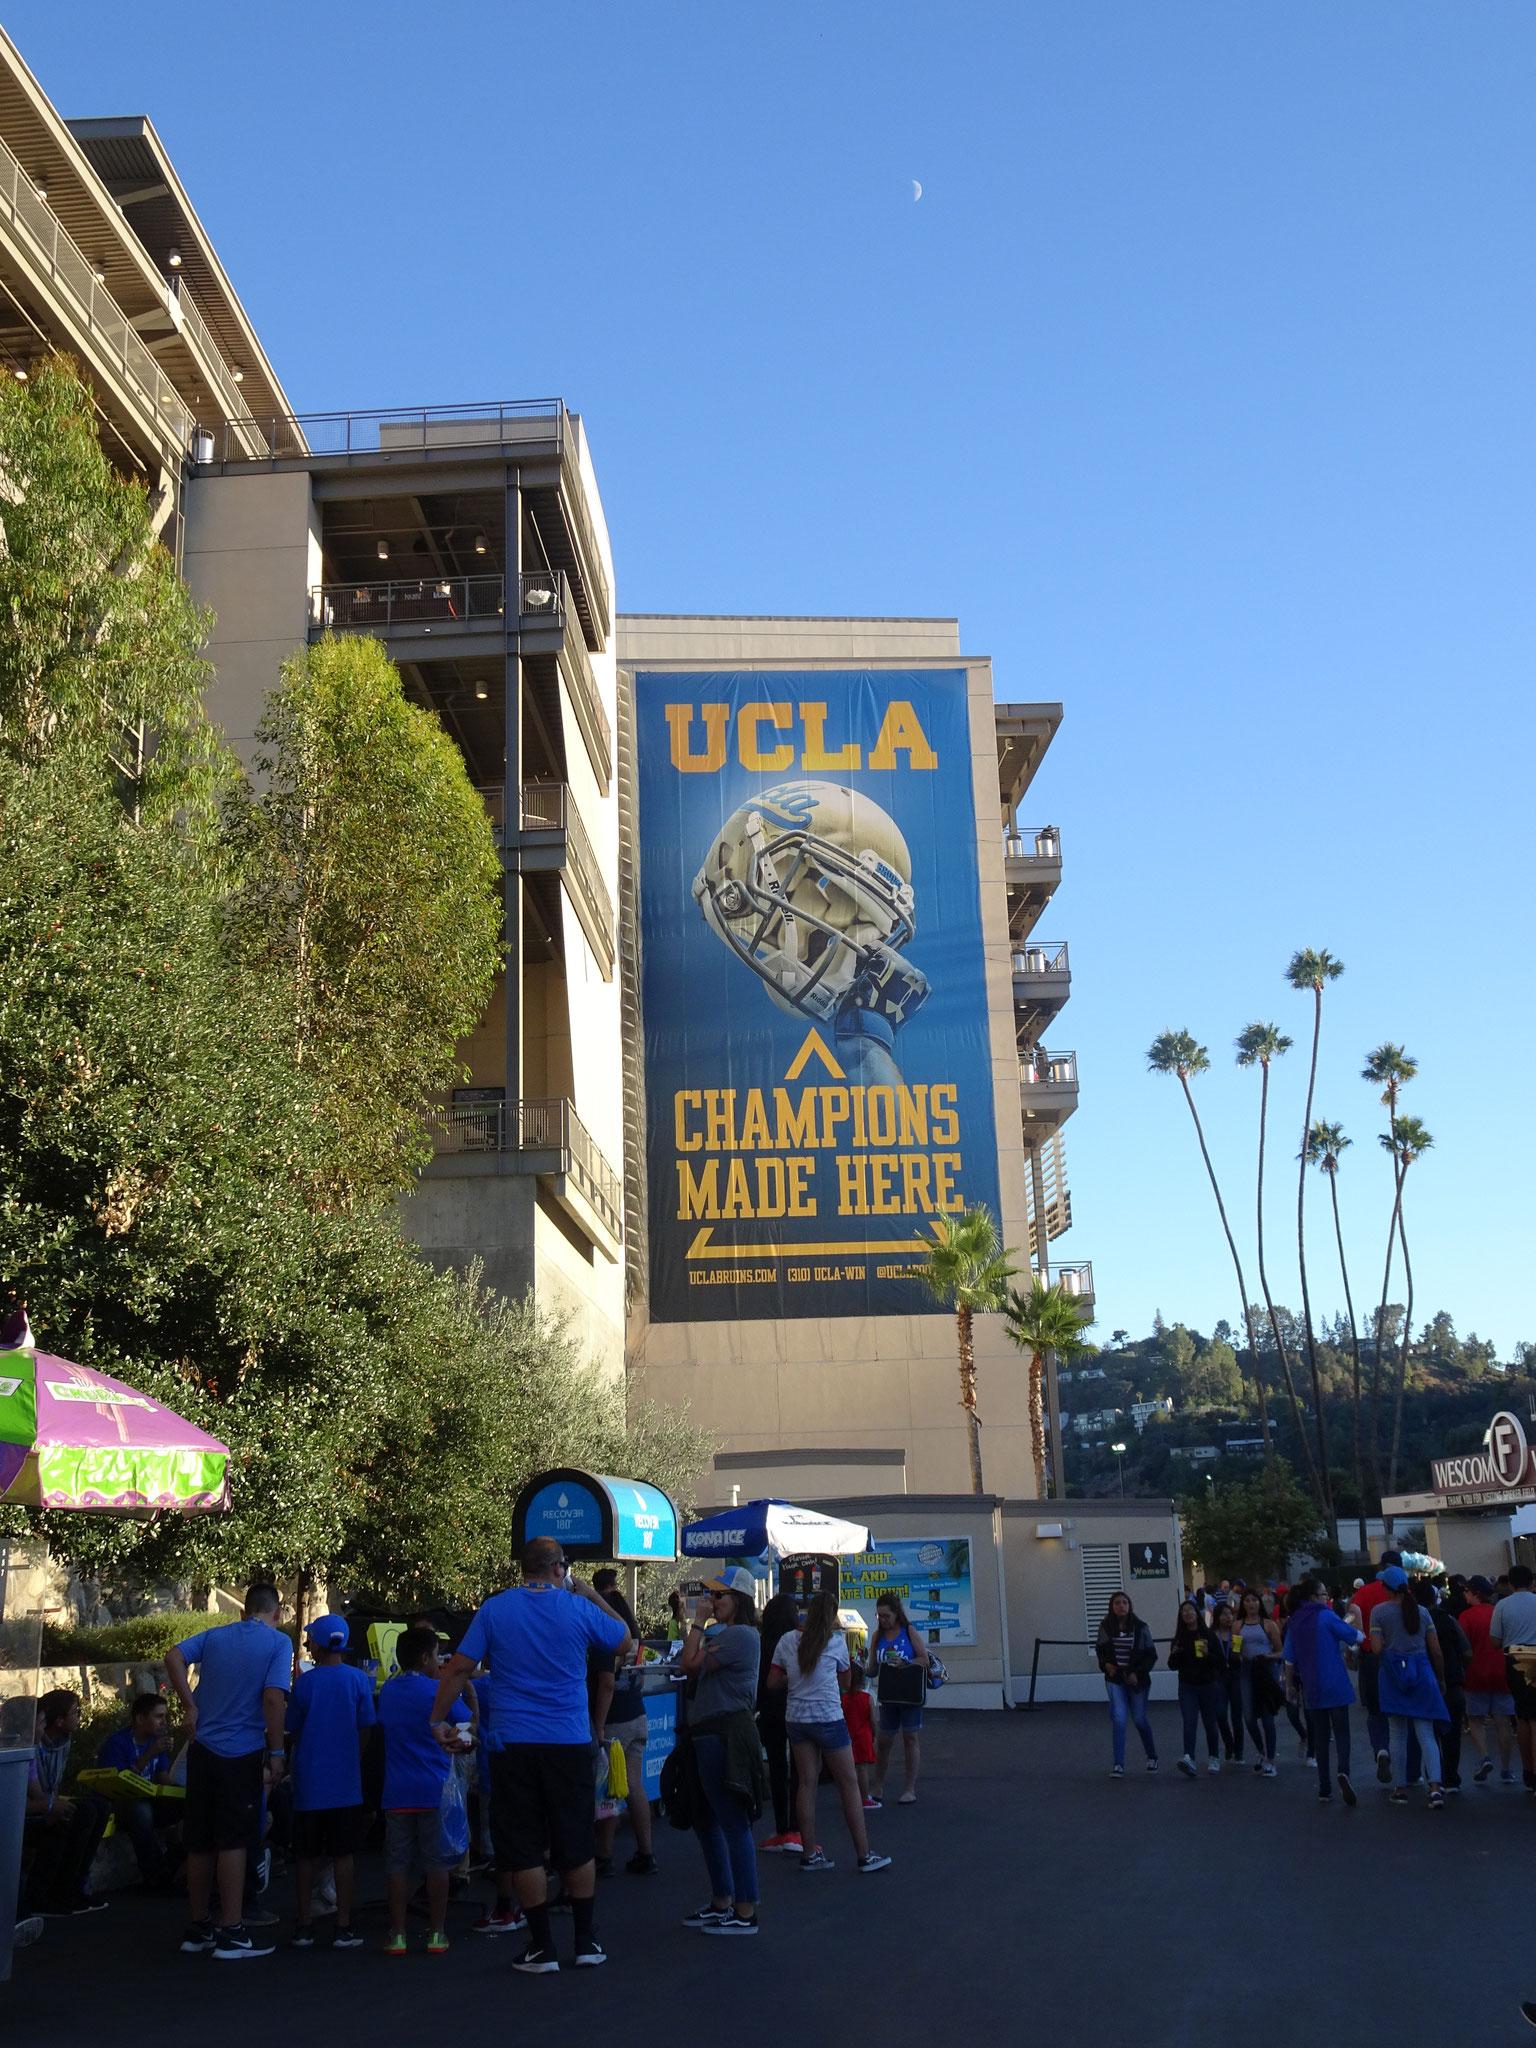 Entrée du Rose Bowl : UCLA Bruins vs Bulldogs de Fresno State (2018/19)